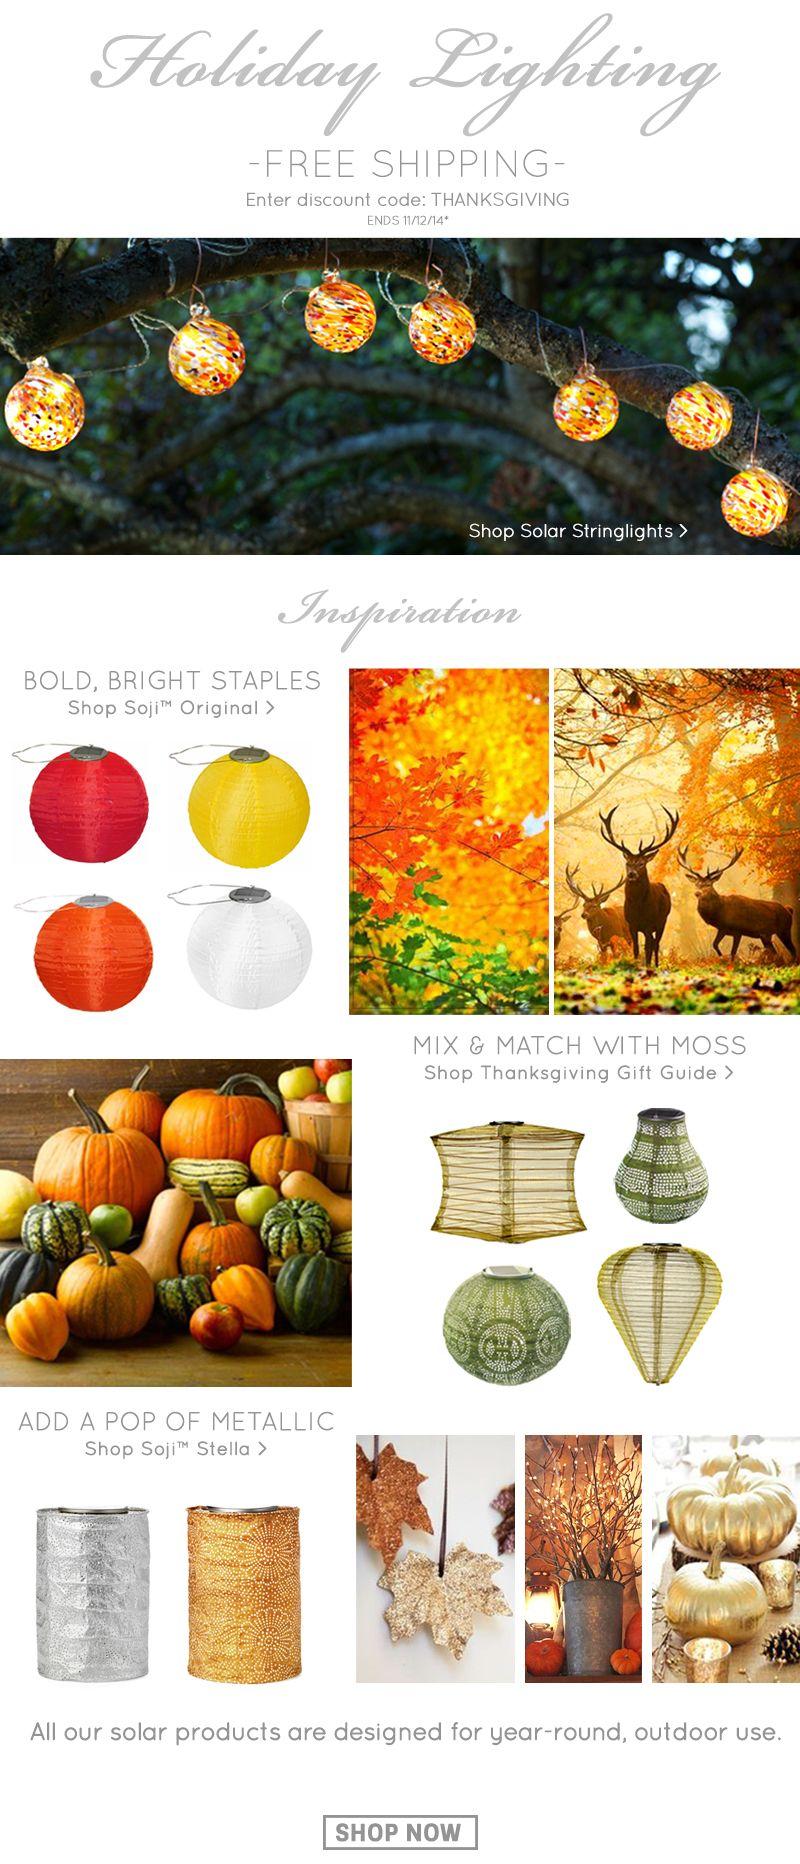 Charming Thanksgiving Gift Guide SOLAR Lanterns Www.allsopgarden.com